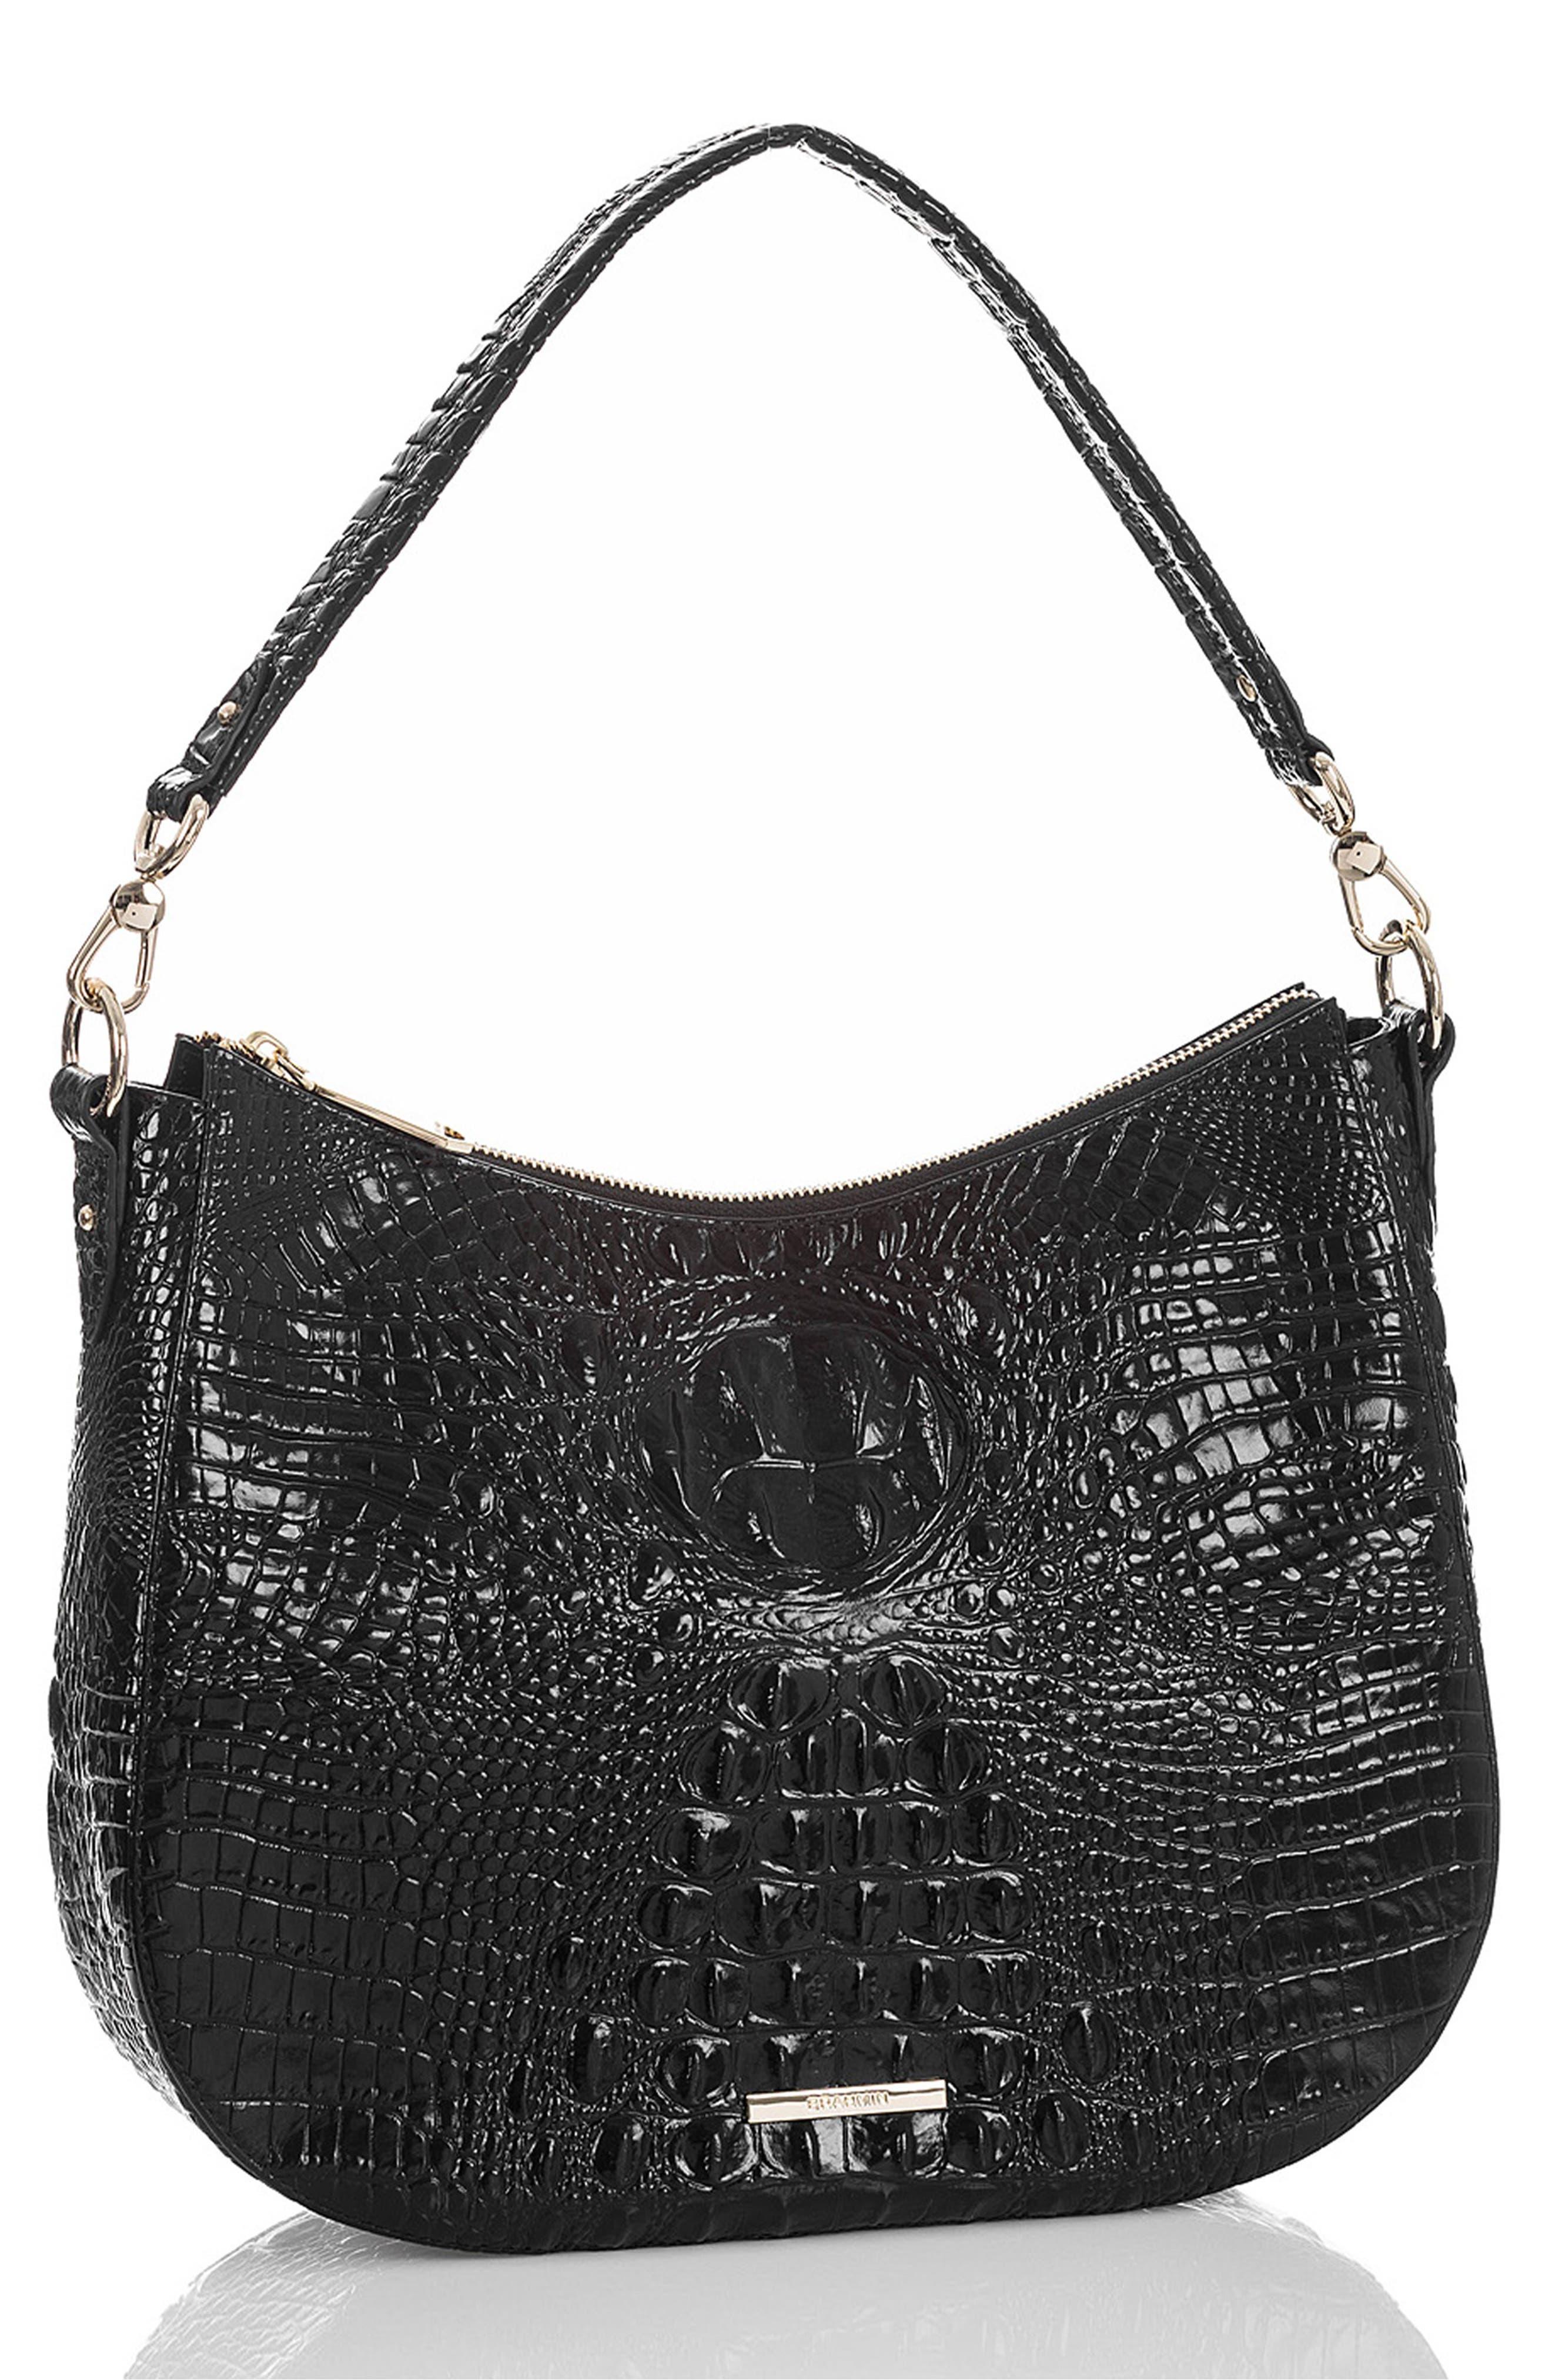 BRAHMIN, Daphne Croc Embossed Leather Hobo, Alternate thumbnail 4, color, 001